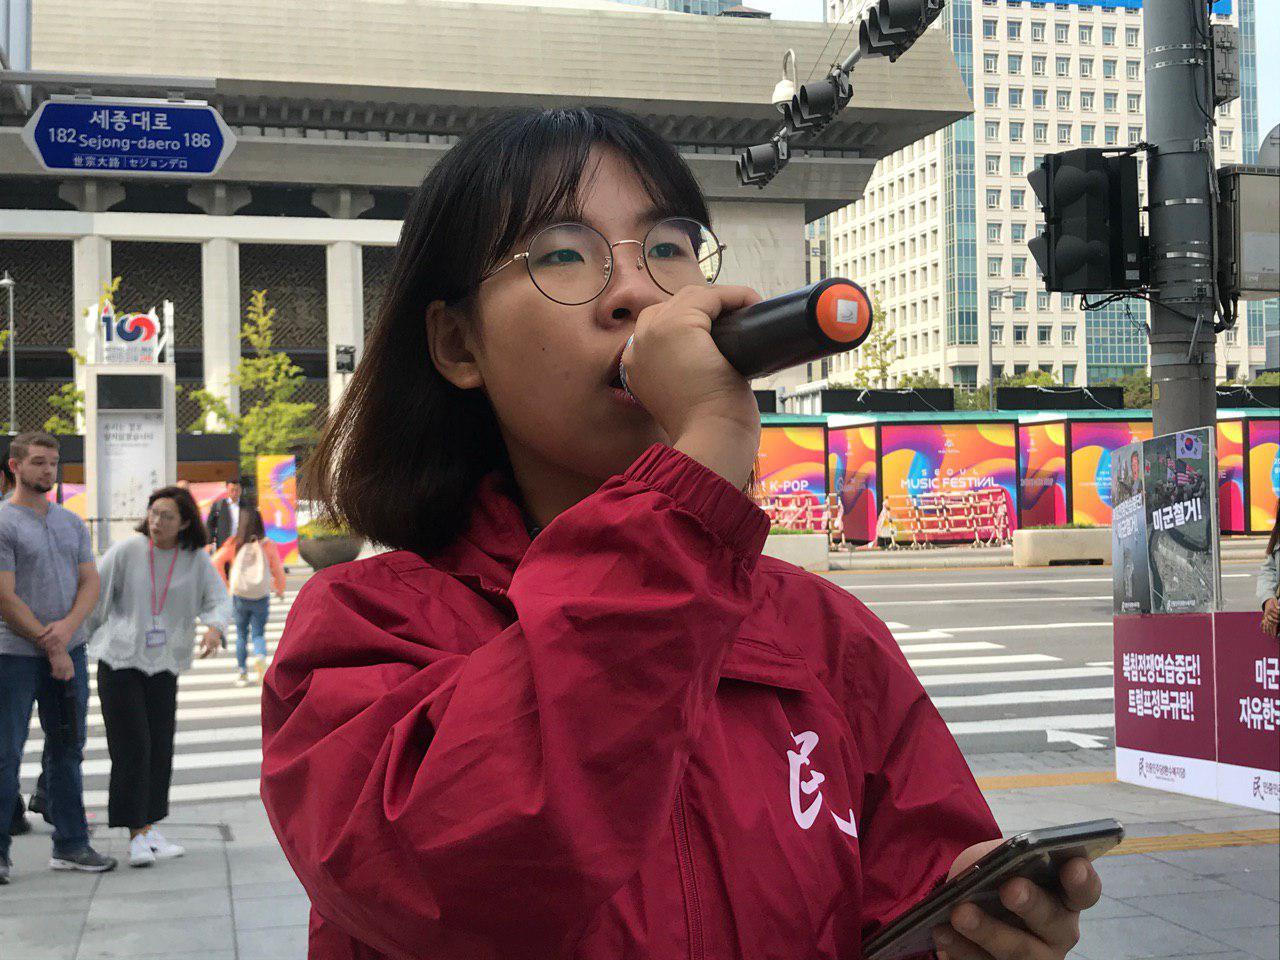 photo_2019-10-01_04-00-48.jpg